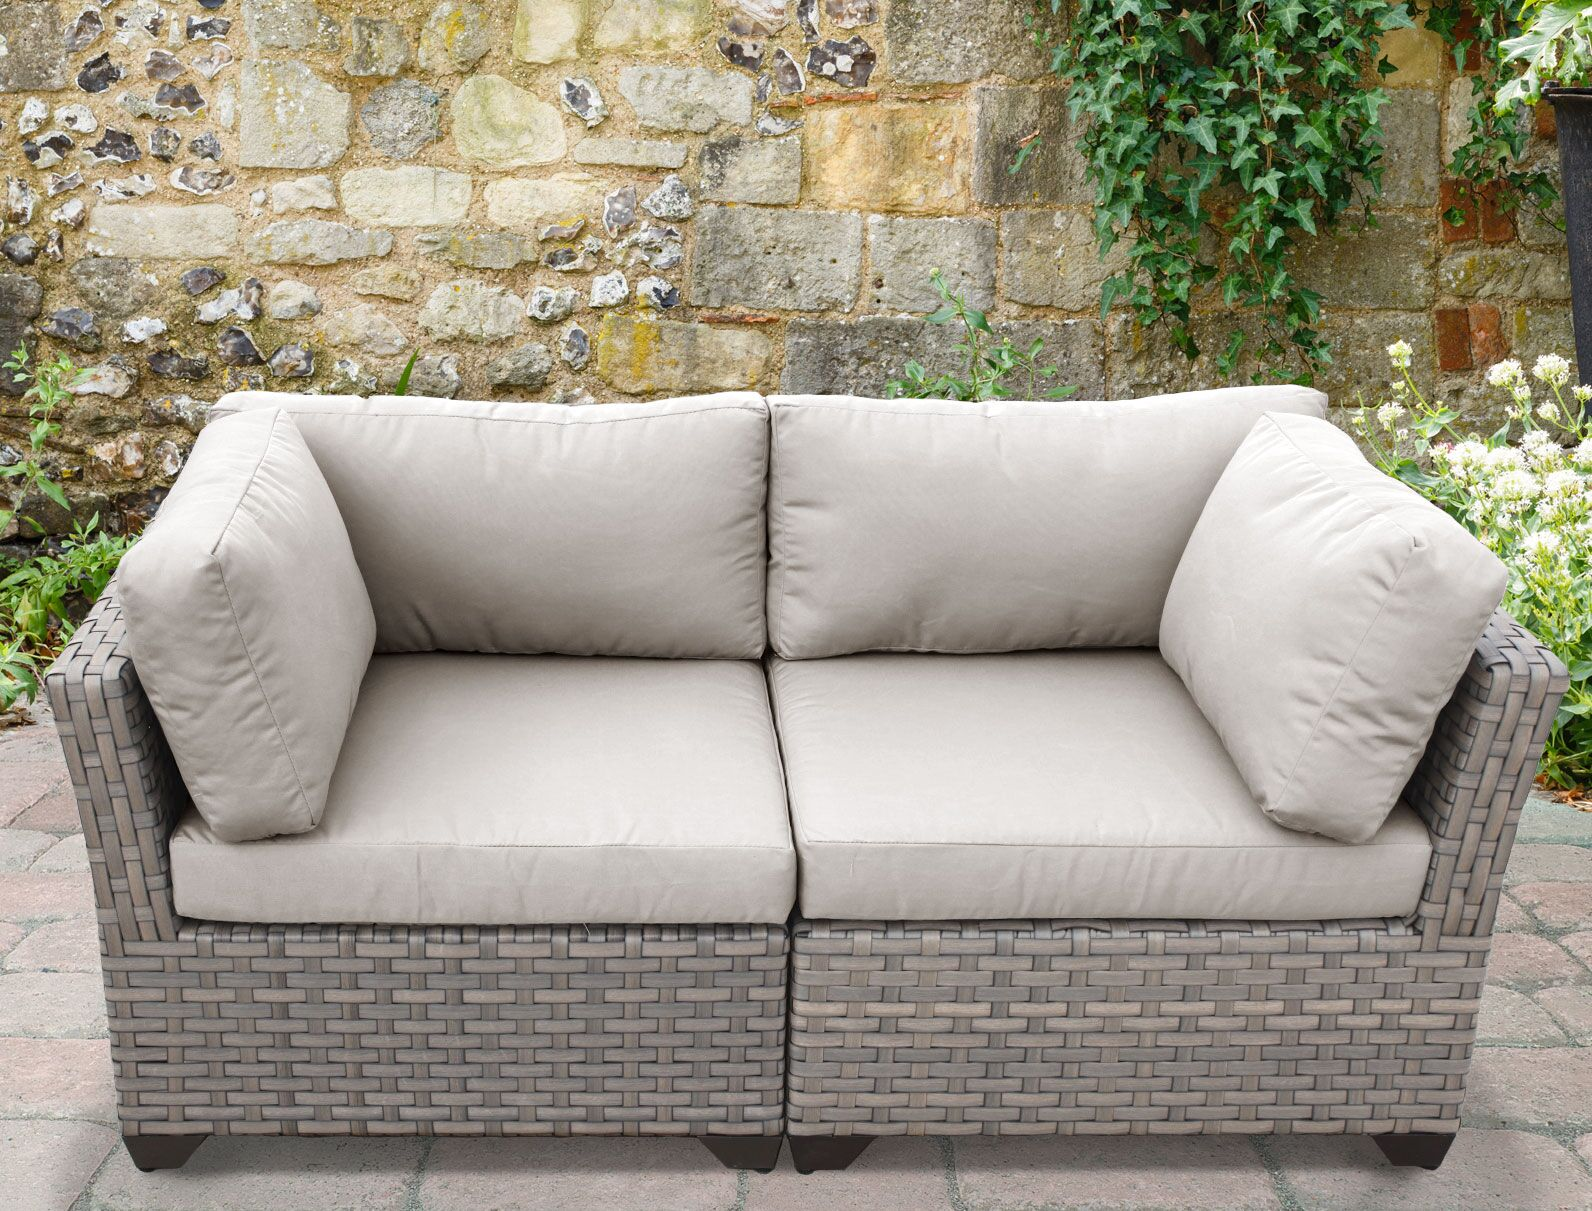 Monterey 2 Piece Conversation Set with Cushions Fabric: Beige